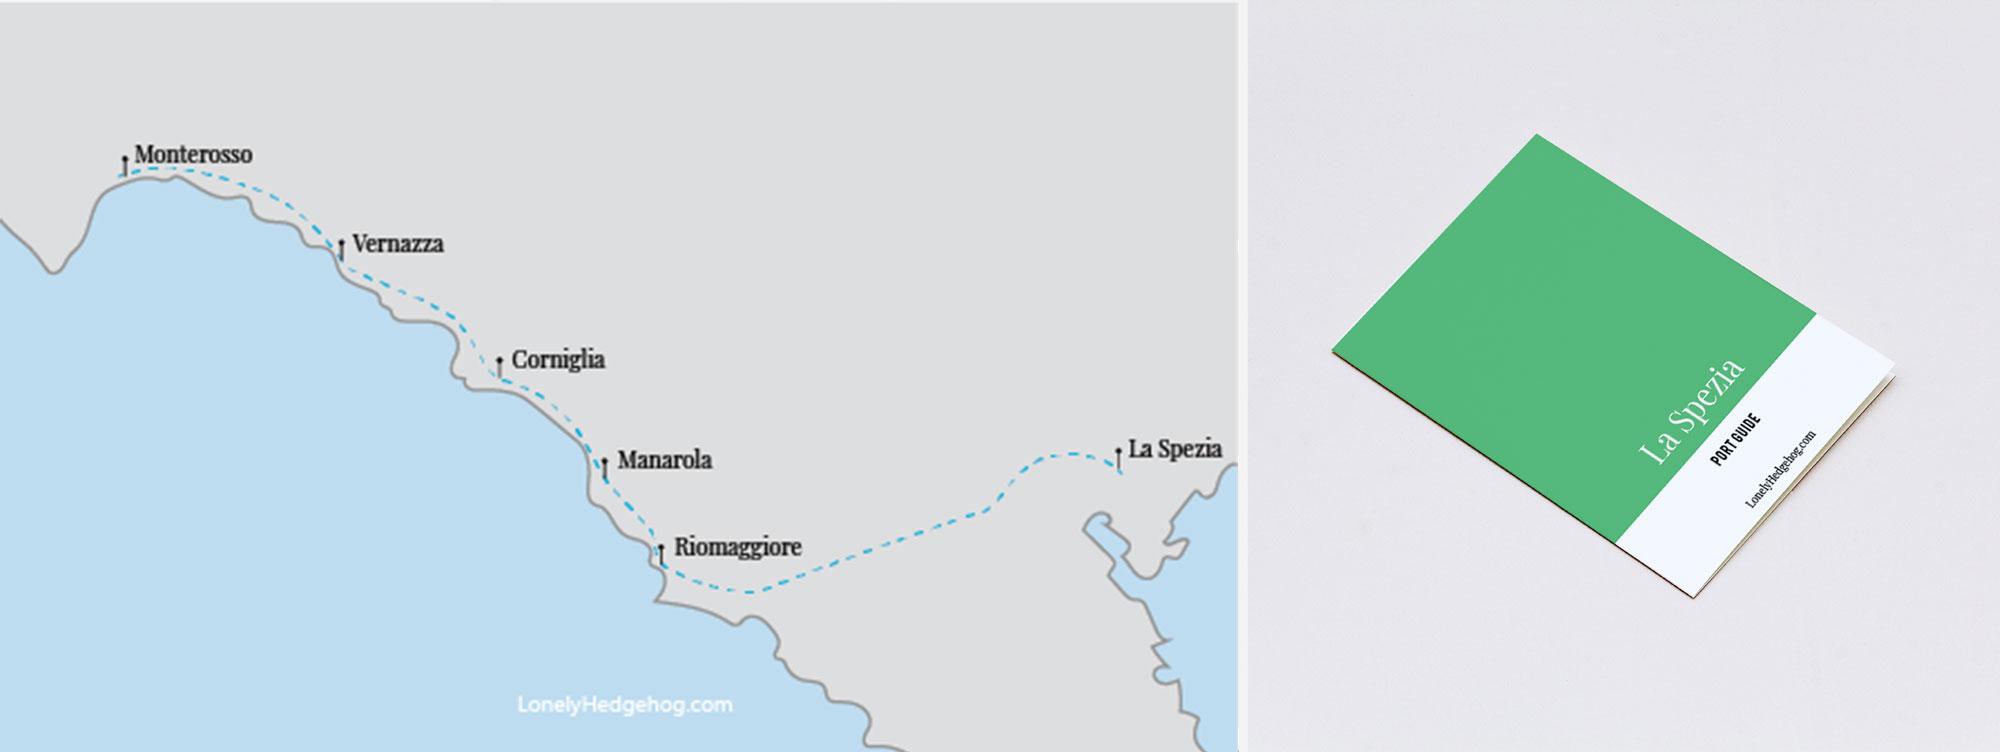 La Spezia printable map